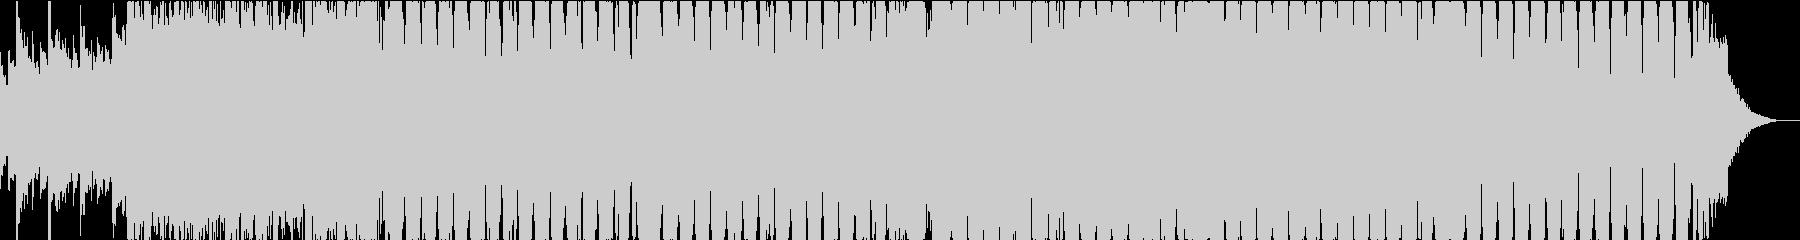 Cinematic Dubstepの未再生の波形